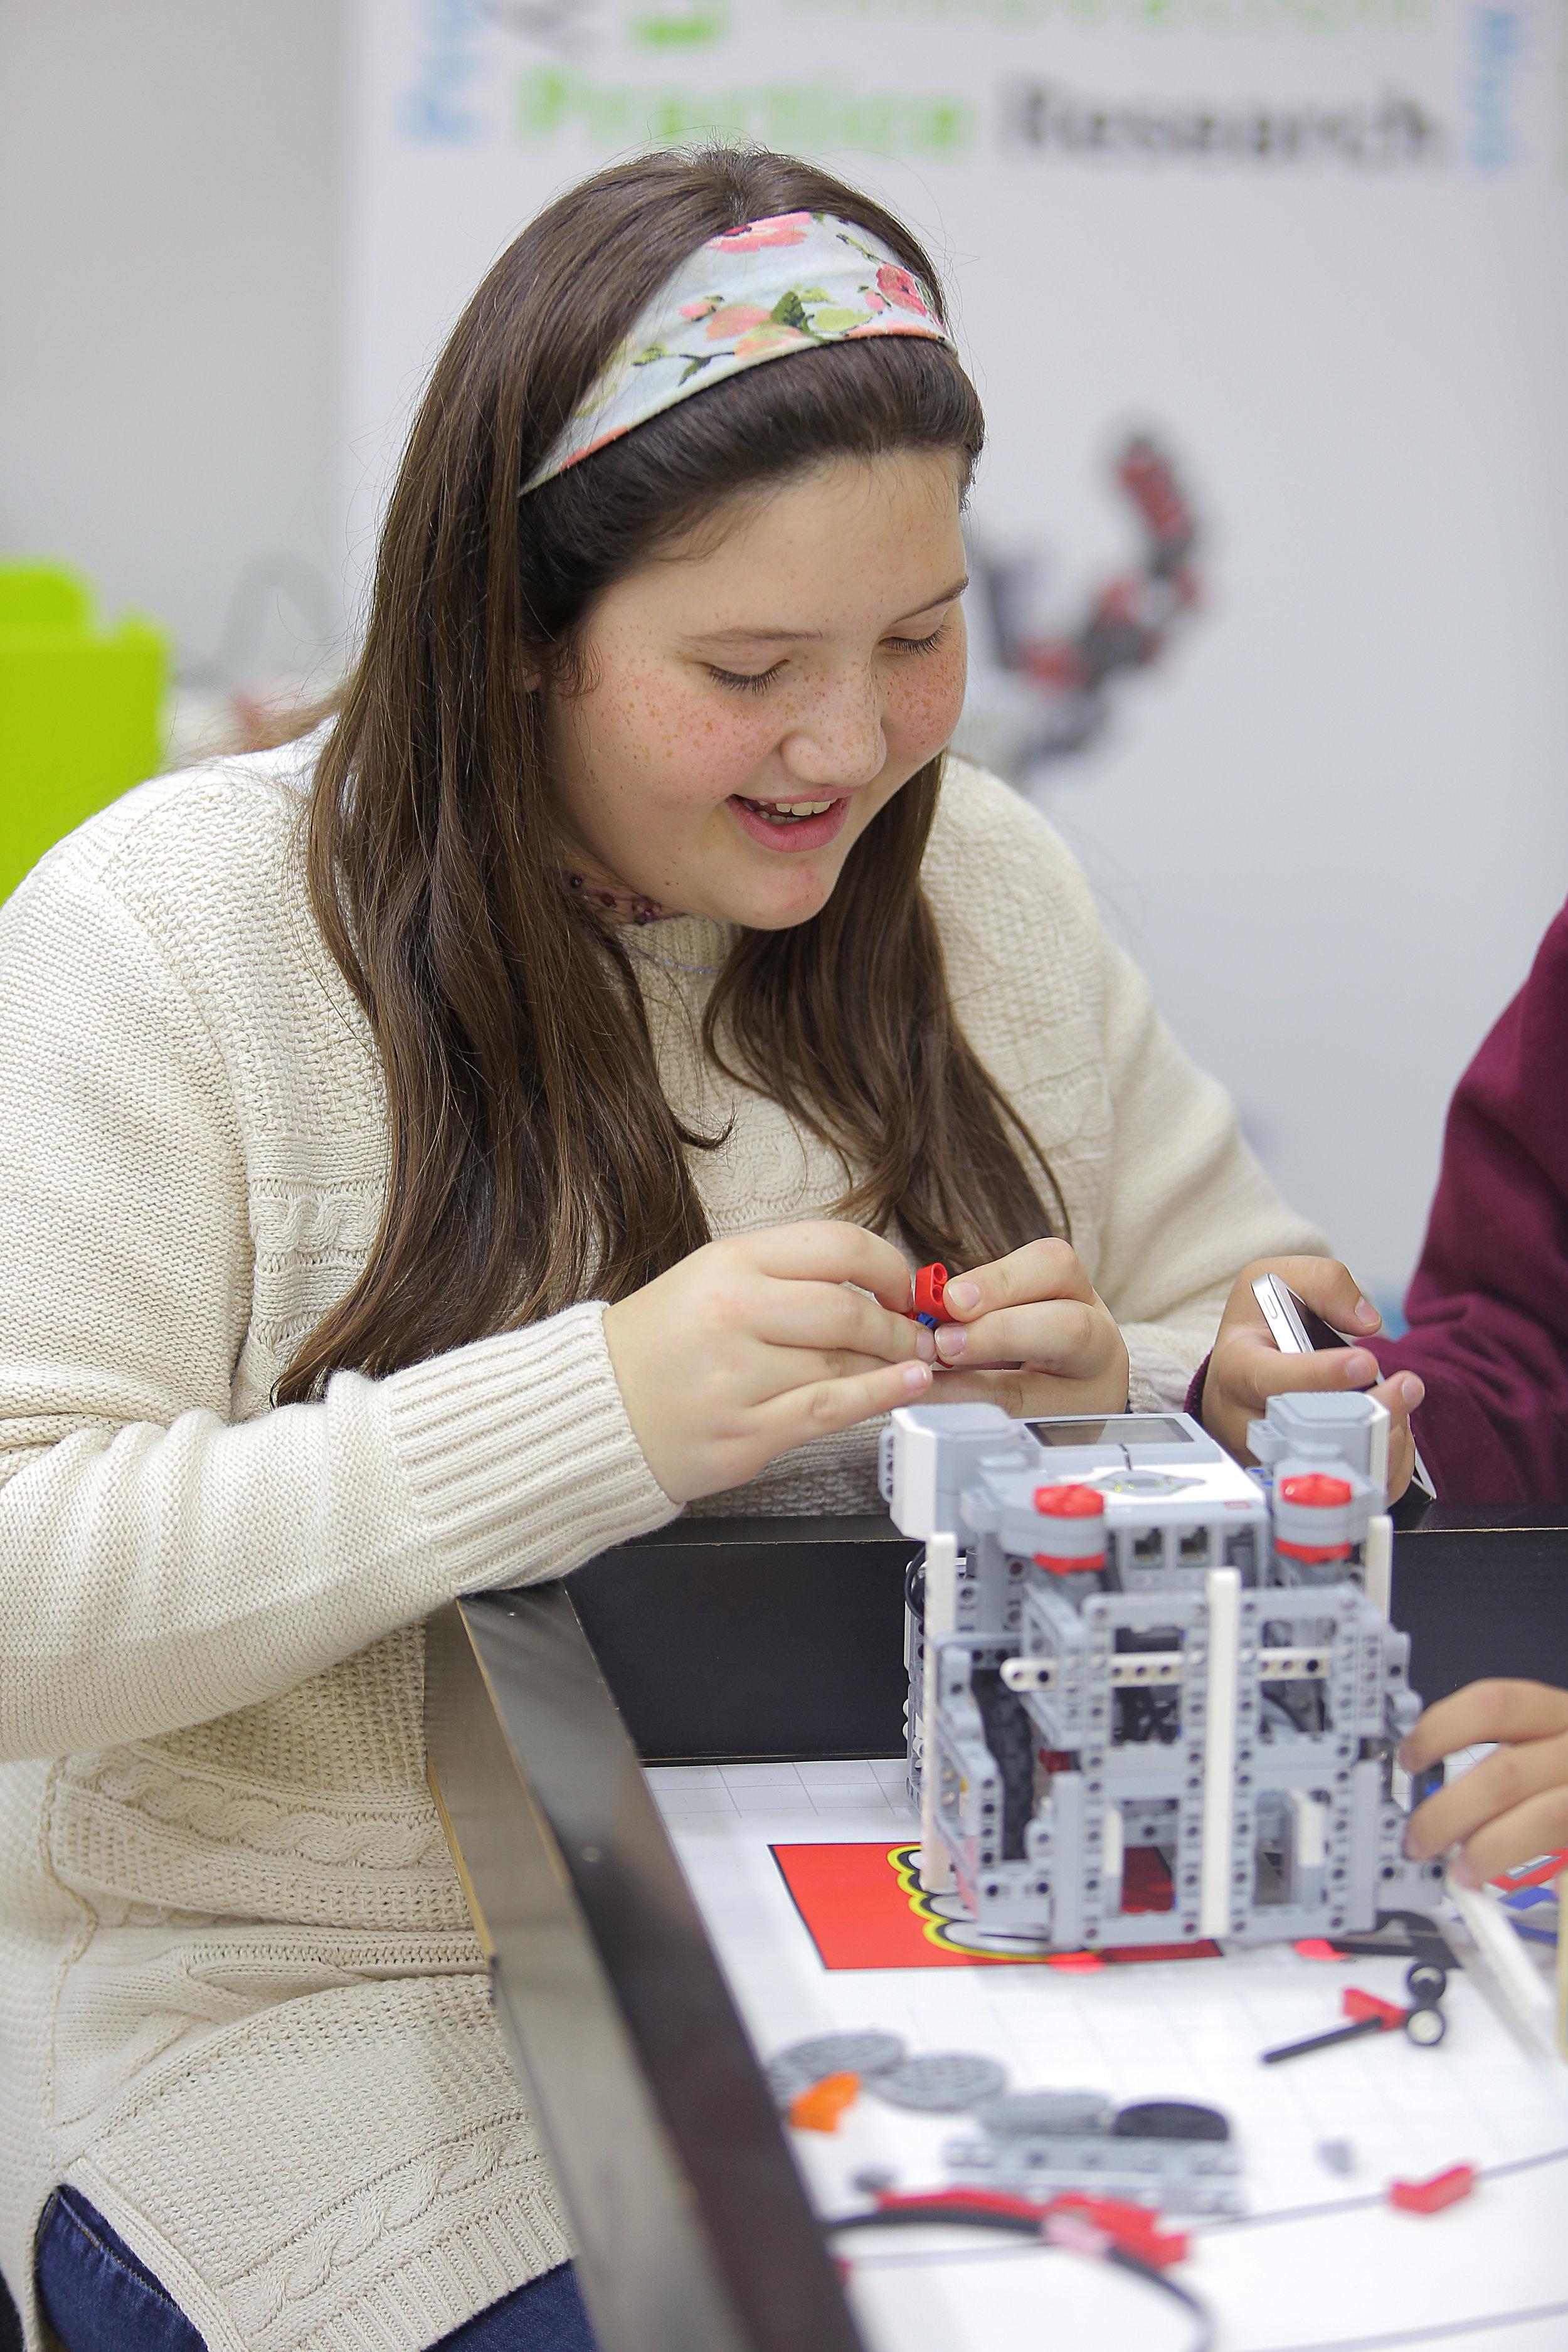 Abeer working on her EV3 Robot